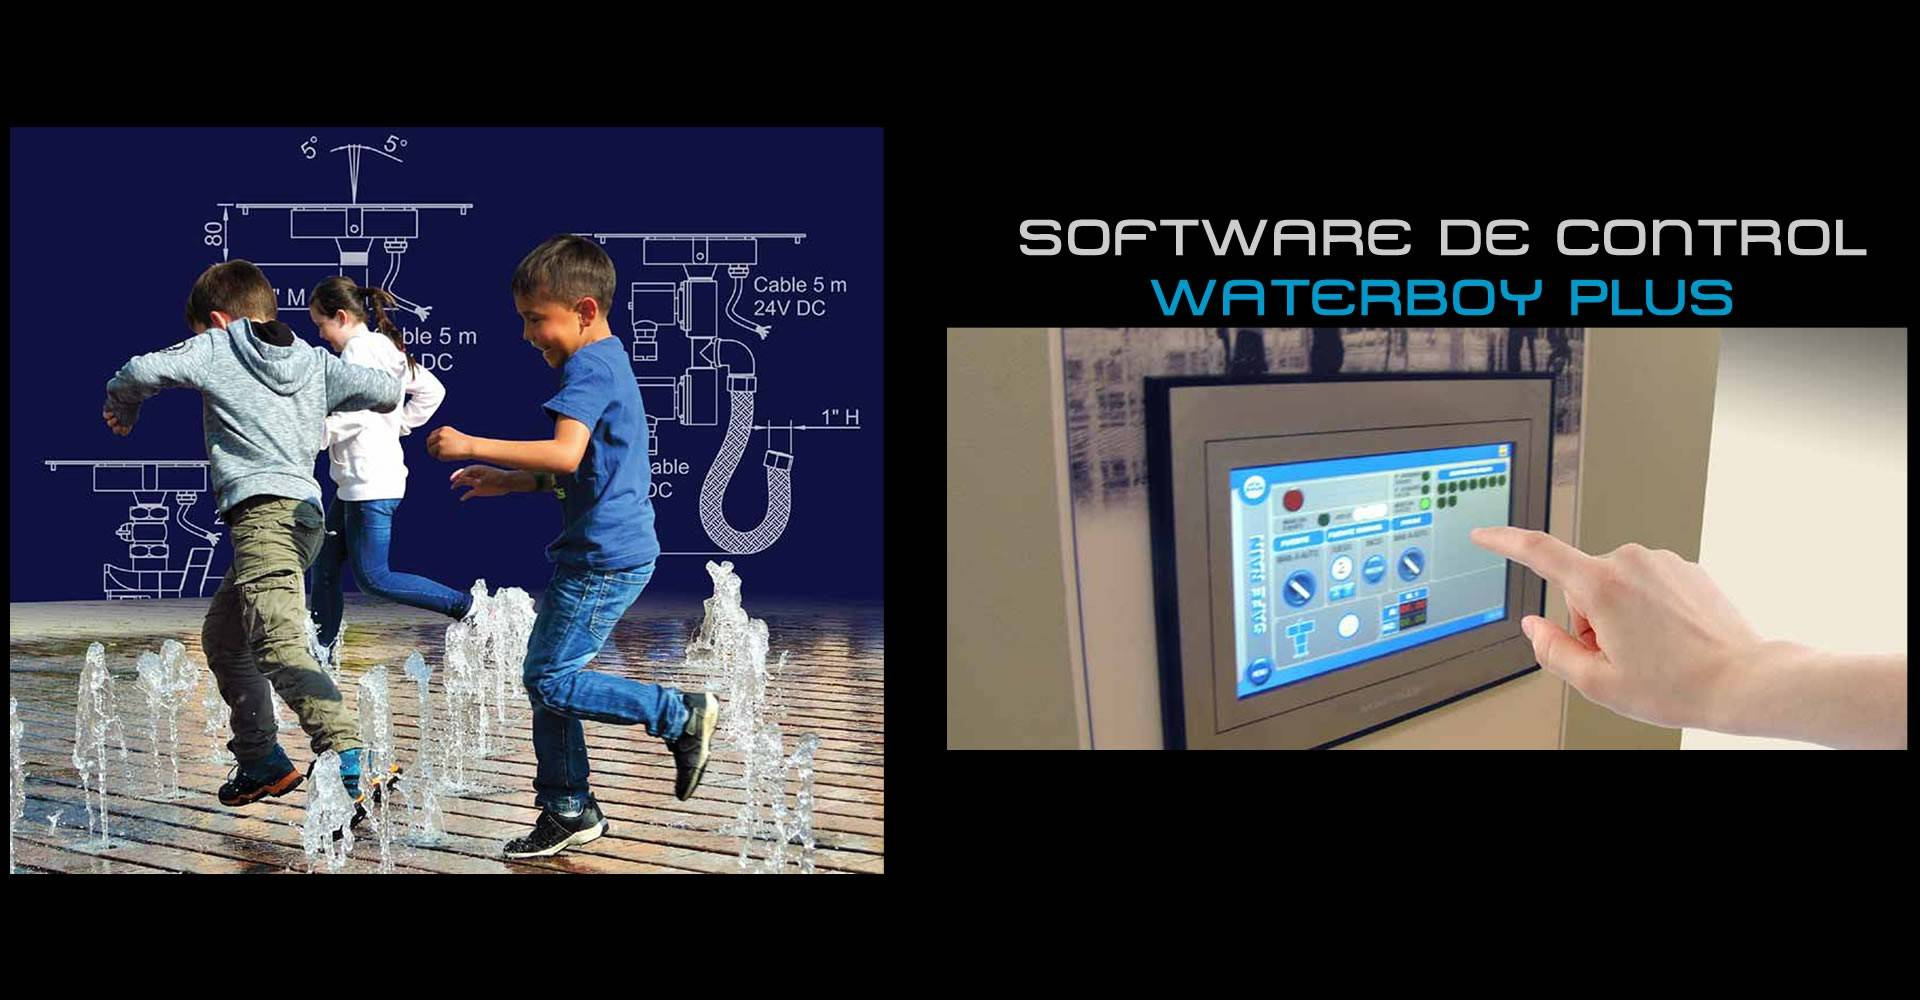 proiect-arteziana-waterboy-plus-06